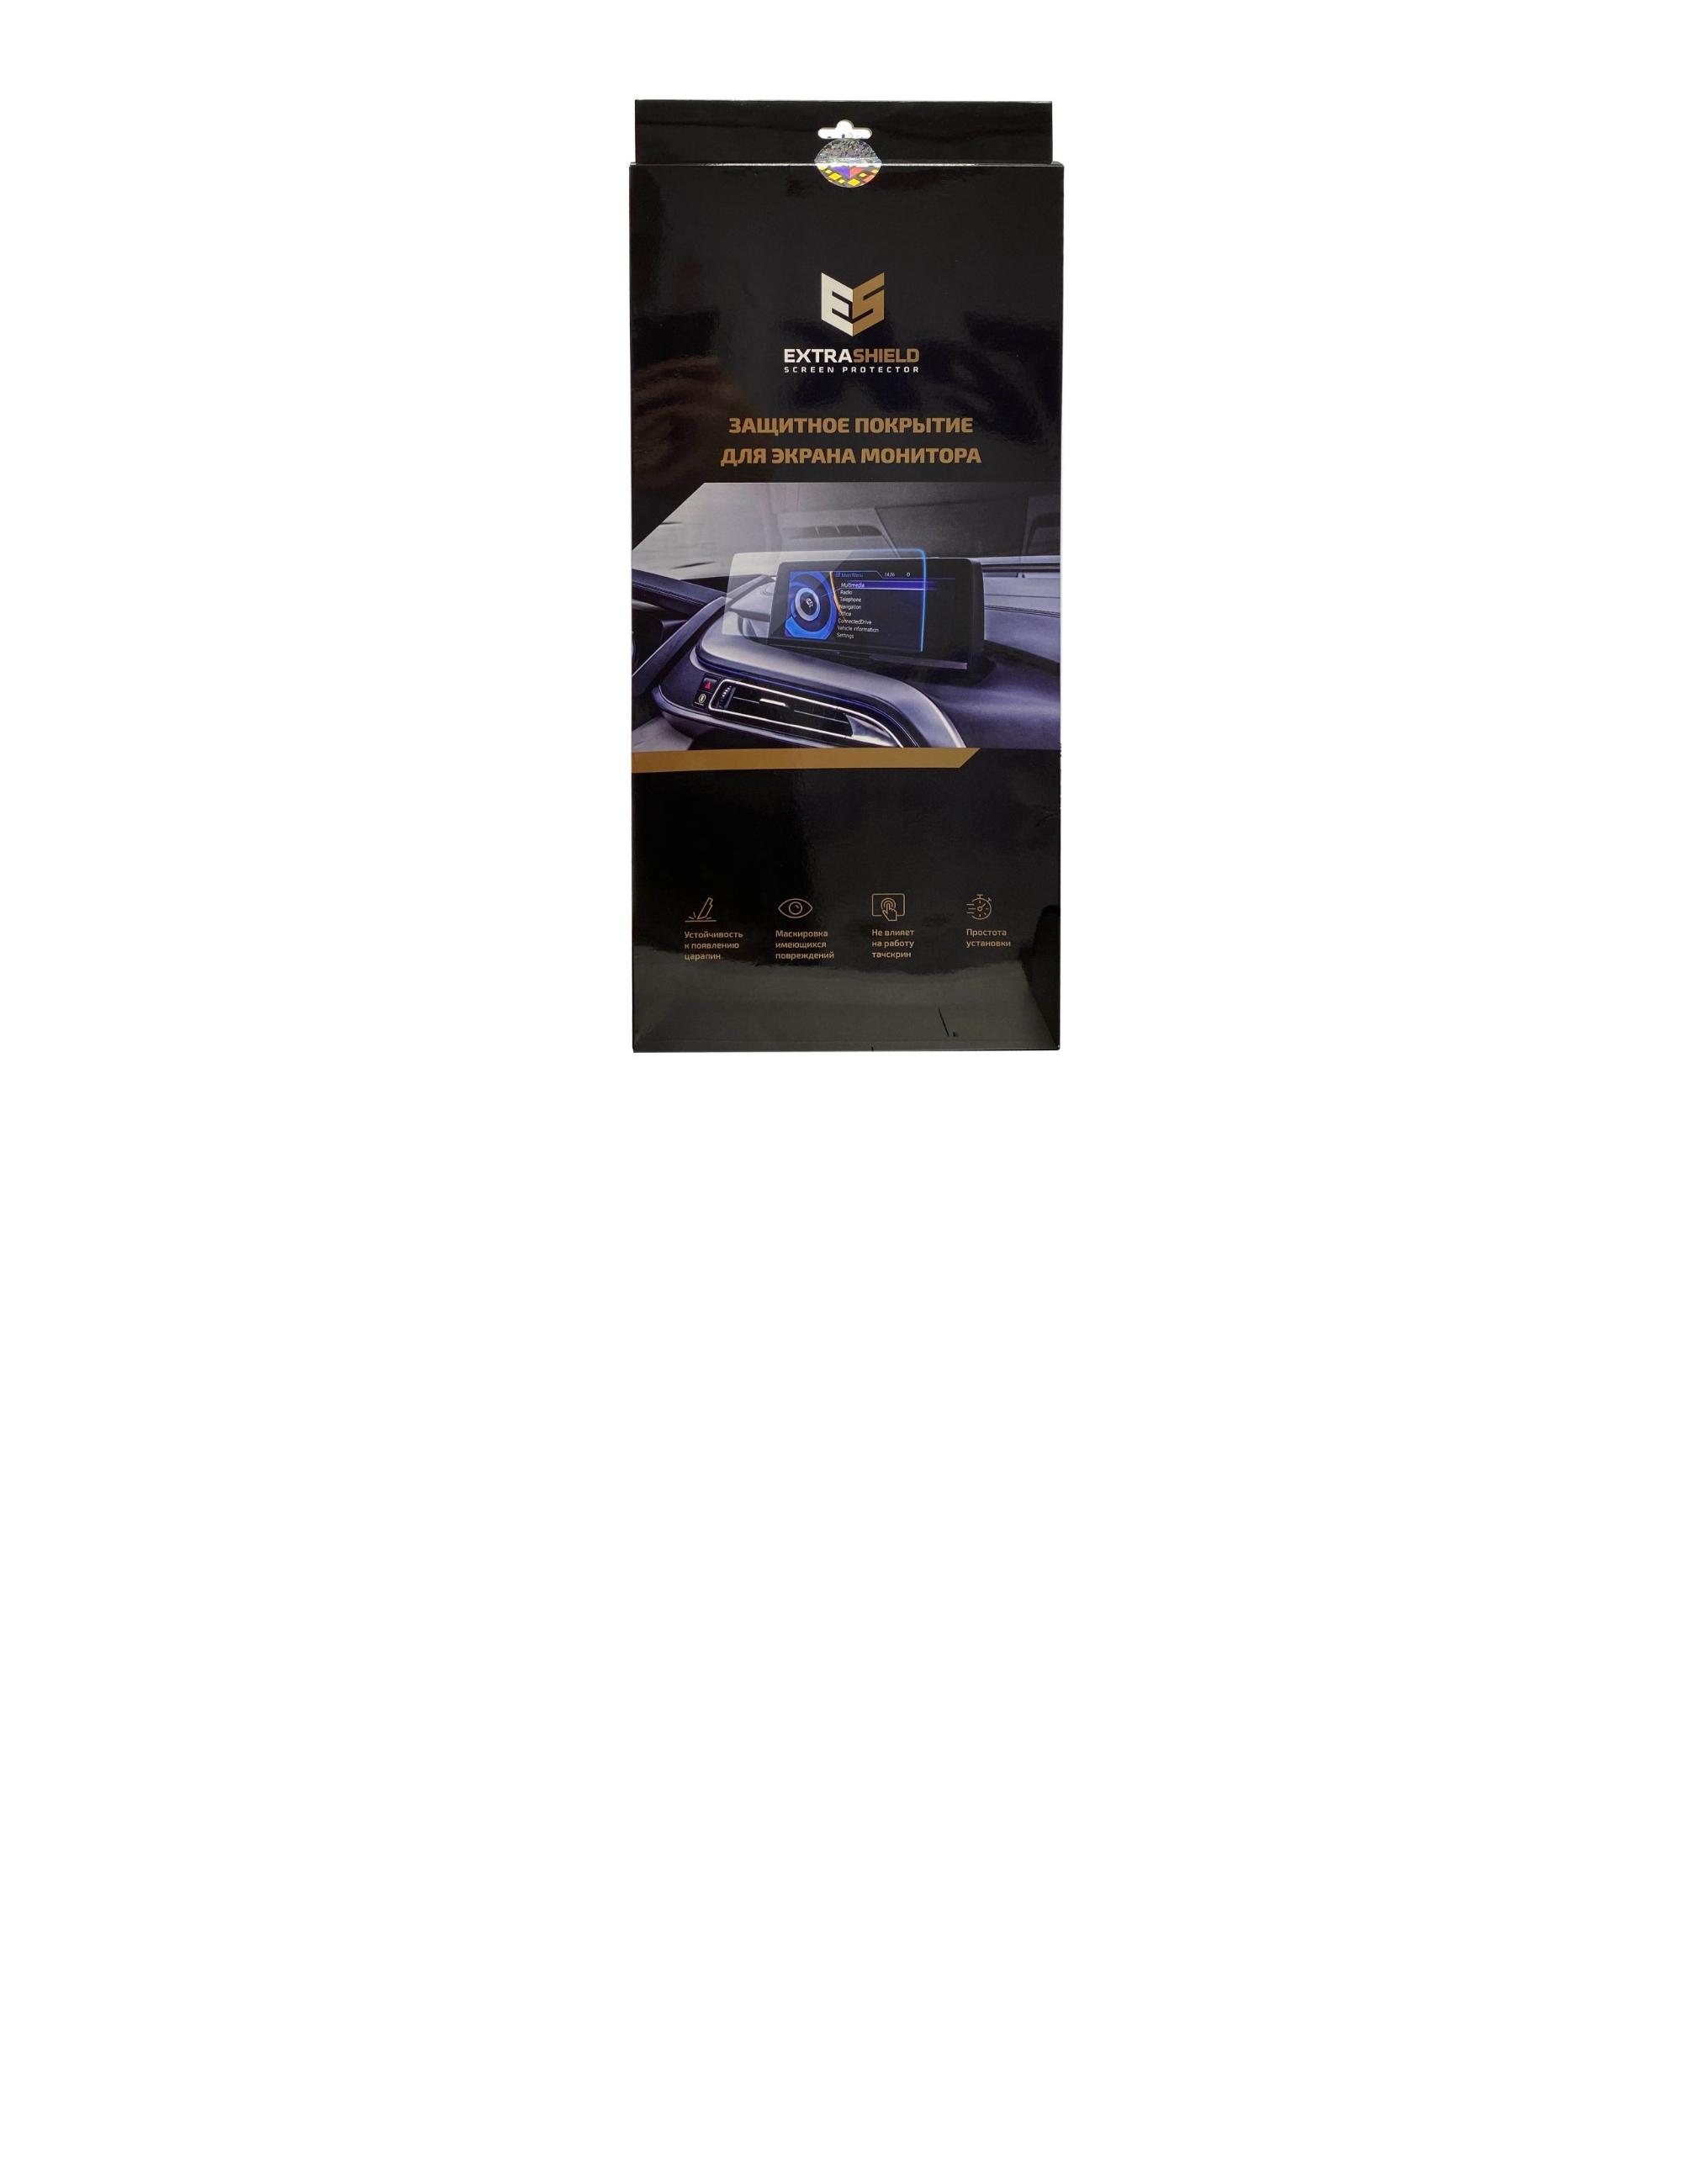 BMW 5 серия  (F10/ F11/ F07) 2013 - 2017 мультимедиа NBT EVO 10,2 Статическая пленка Матовая